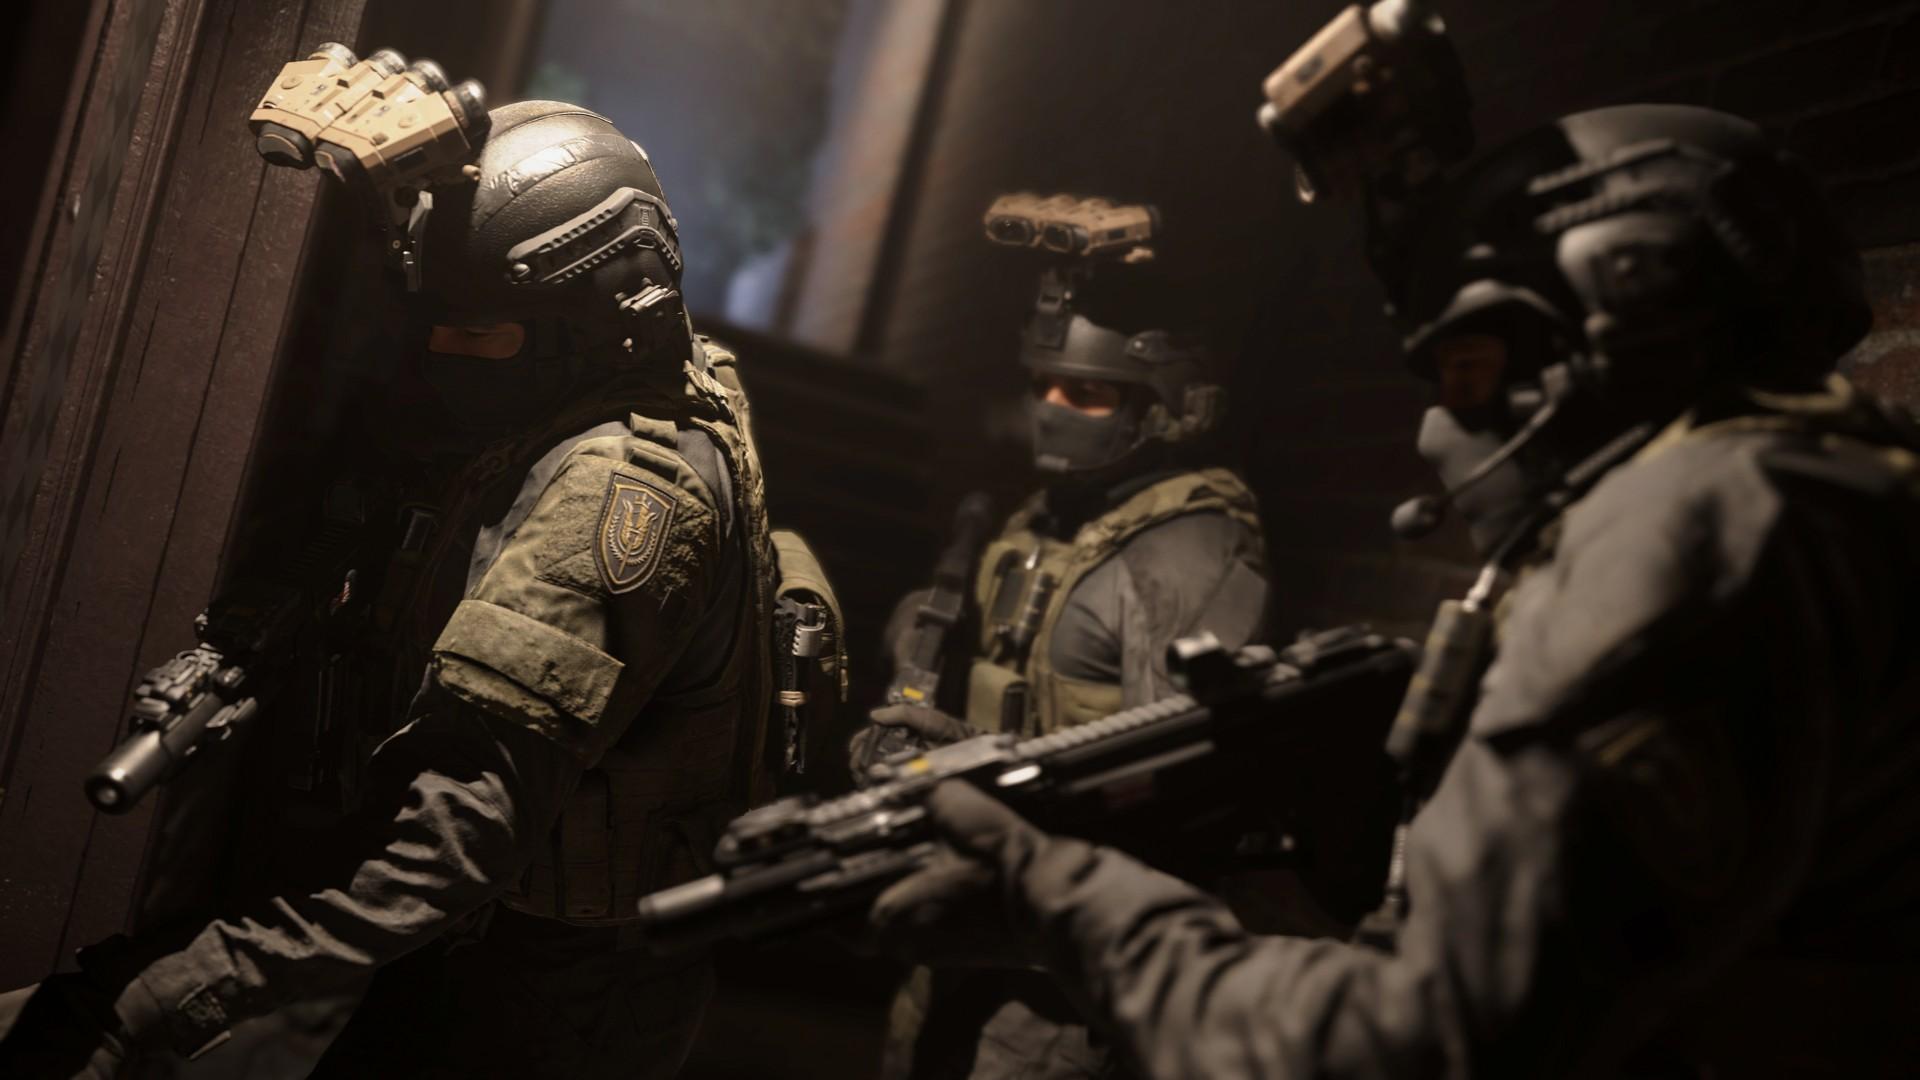 Call of Duty: Modern Warfare Perks